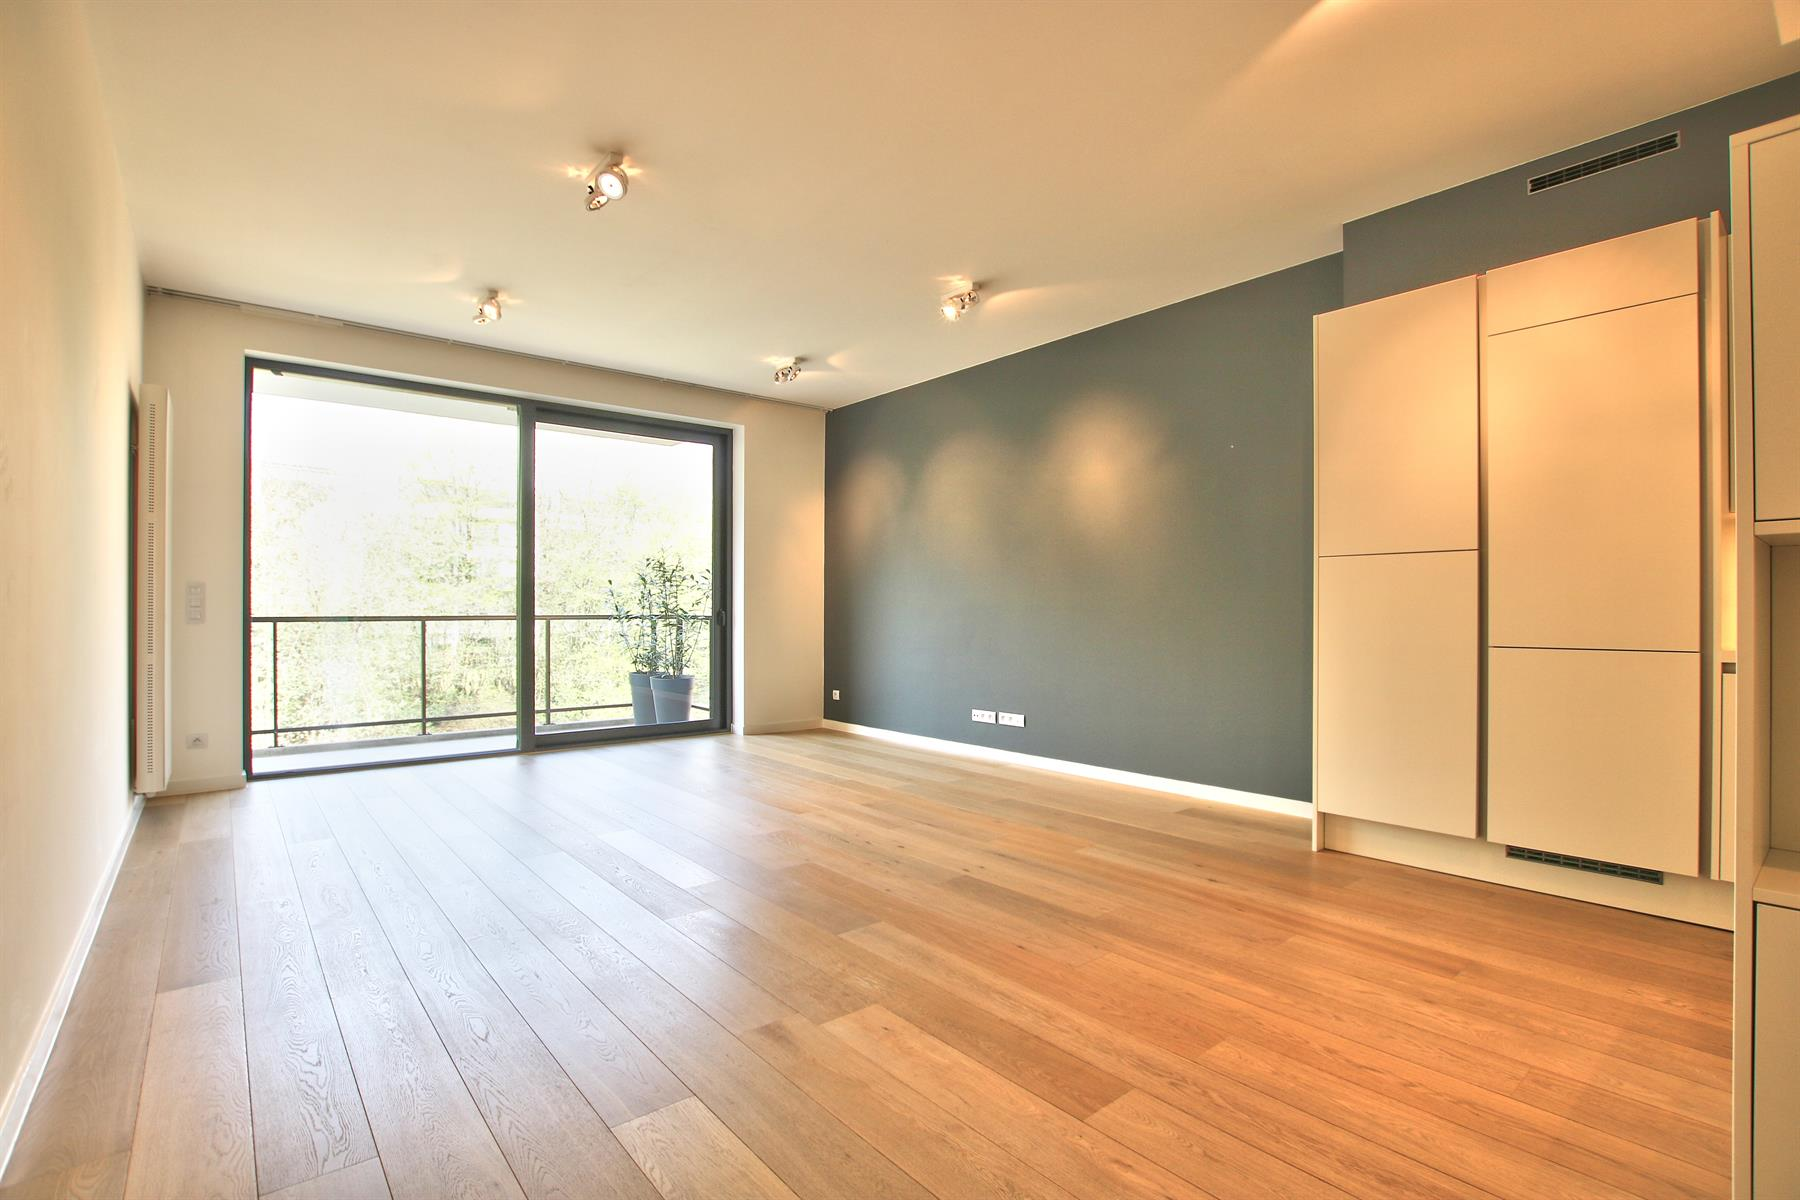 Appartement - Woluwe-Saint-Lambert - #4324368-11